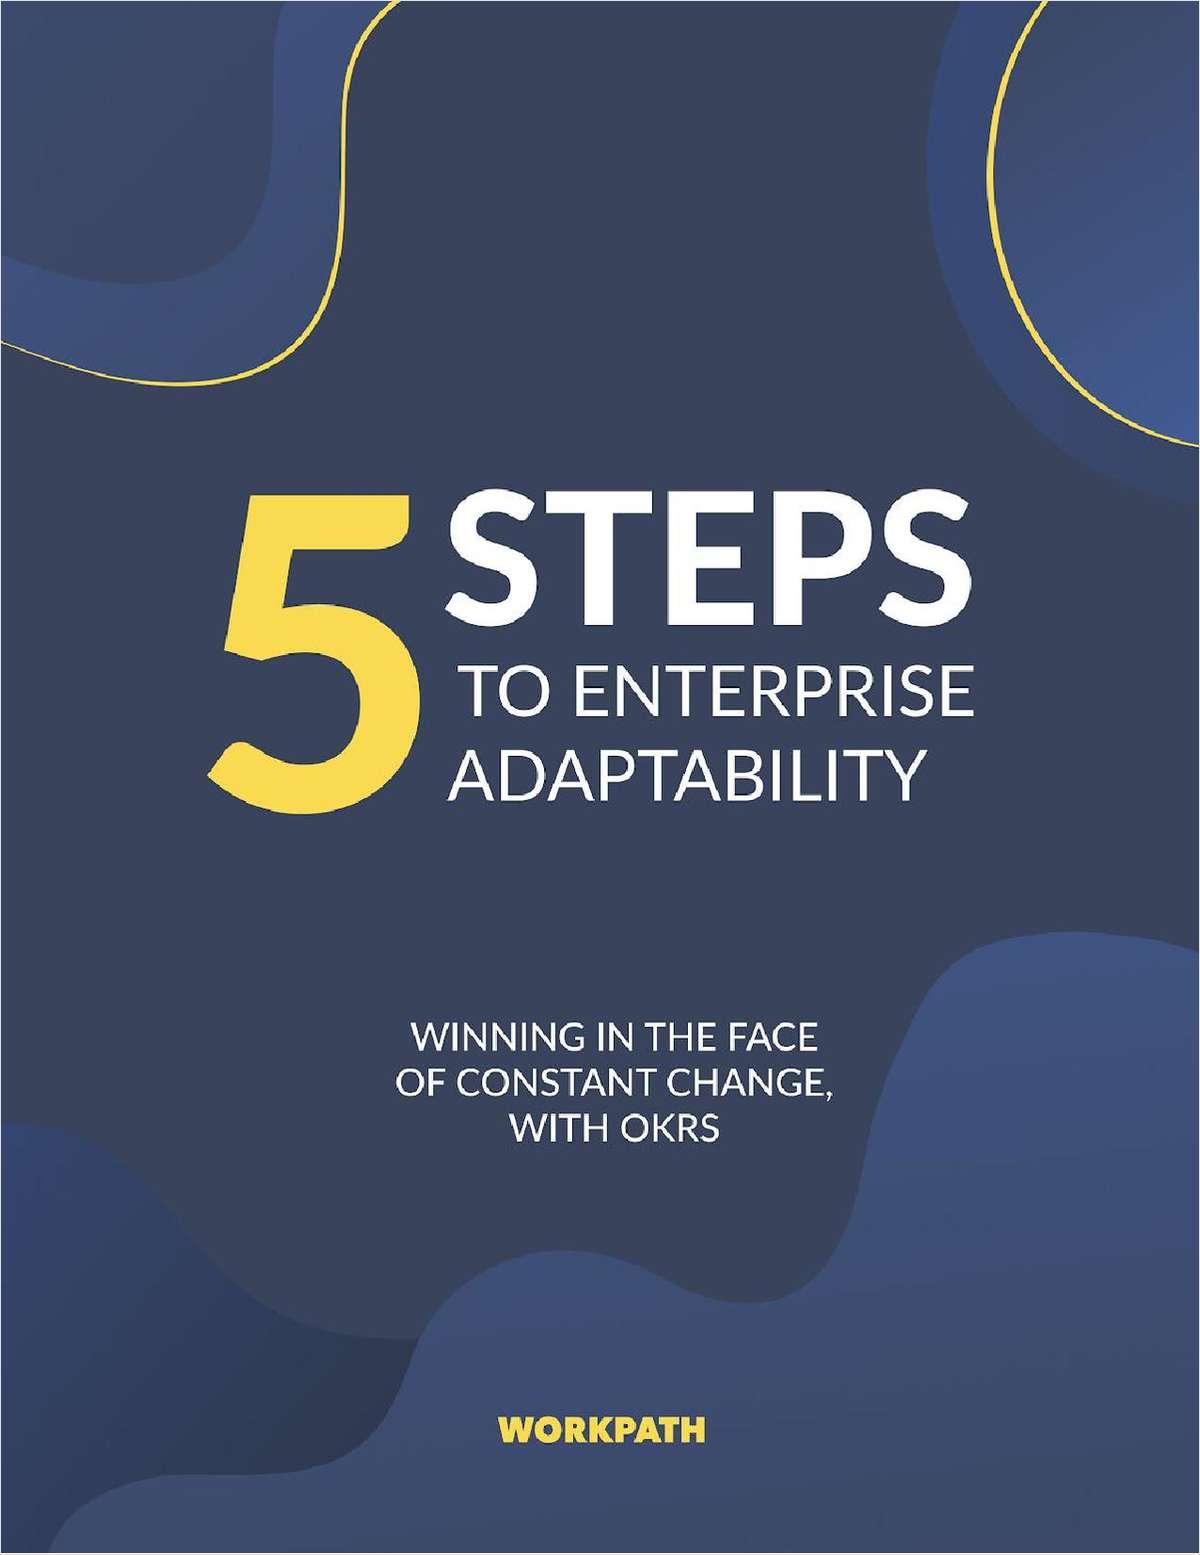 5 steps to enterprise adaptability